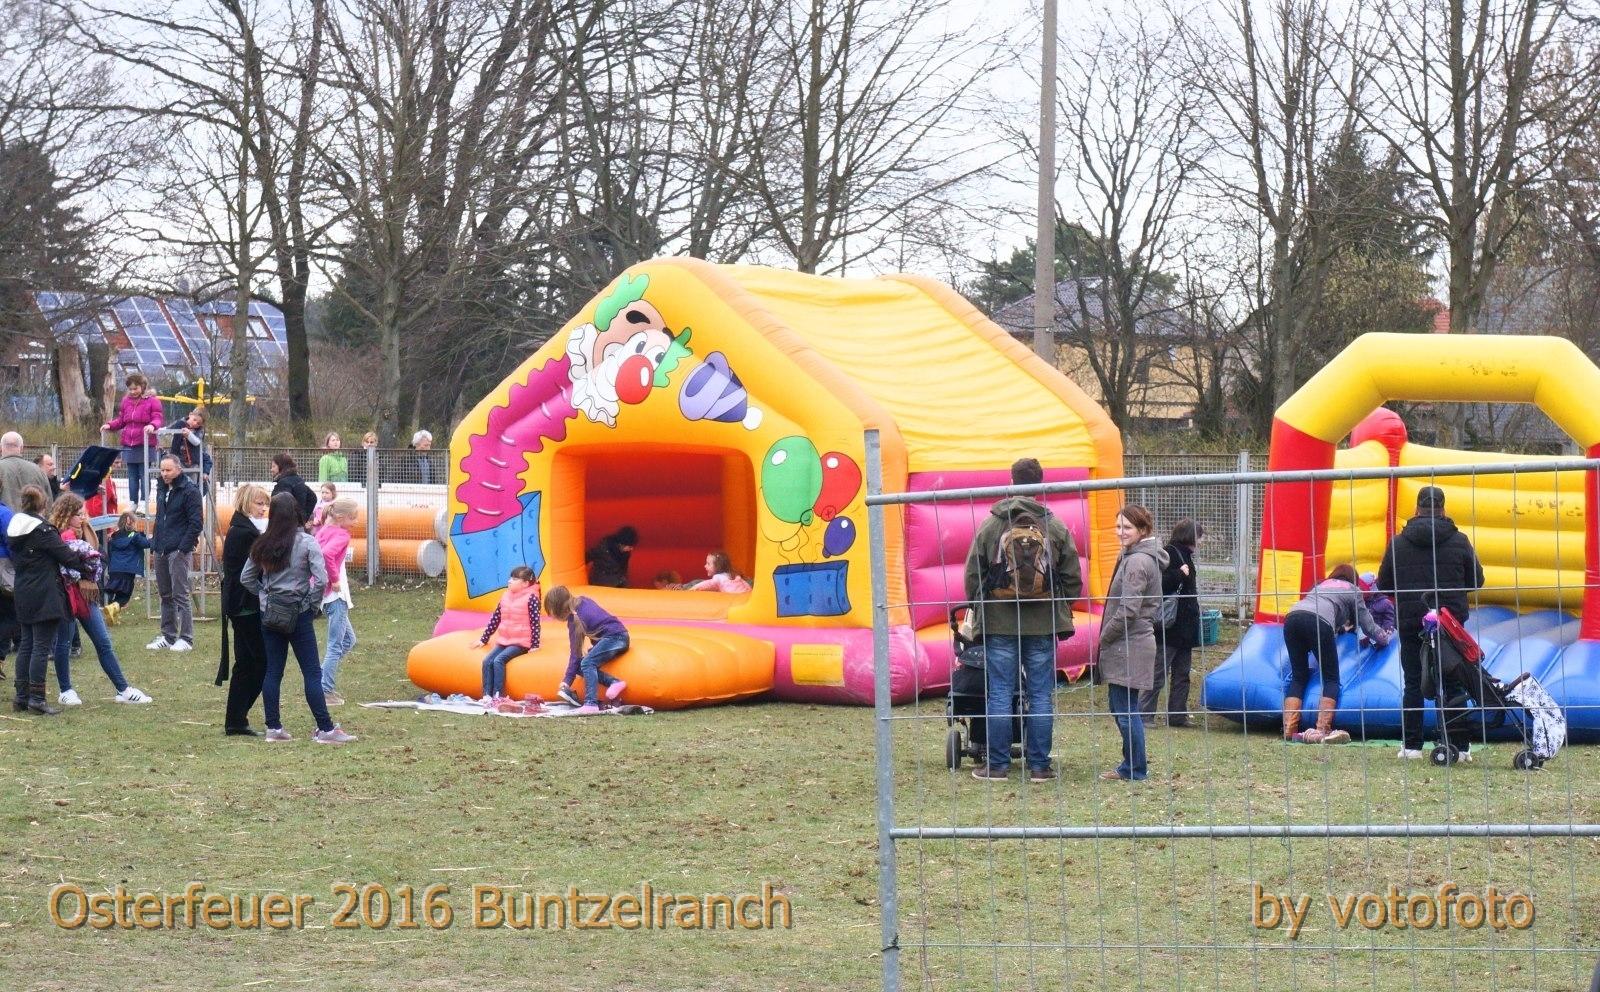 Osterfeuer 2016 Buntzelranch  107